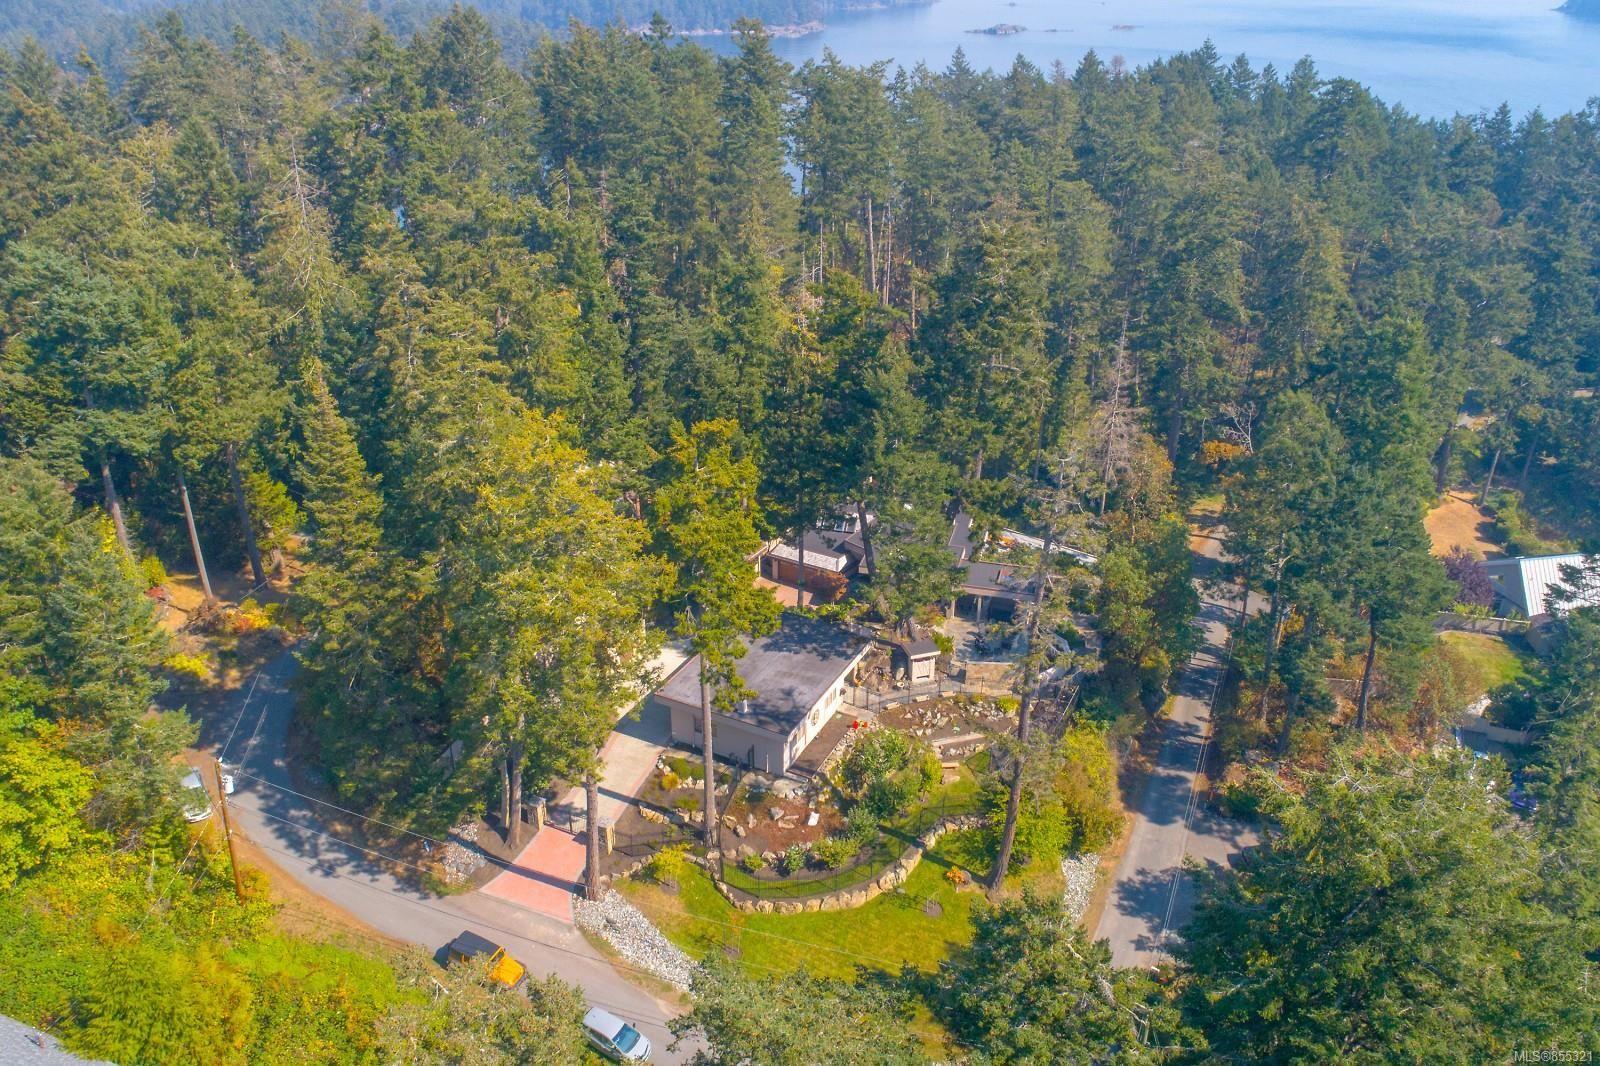 Main Photo: 10849 Fernie Wynd Rd in : NS Curteis Point House for sale (North Saanich)  : MLS®# 855321